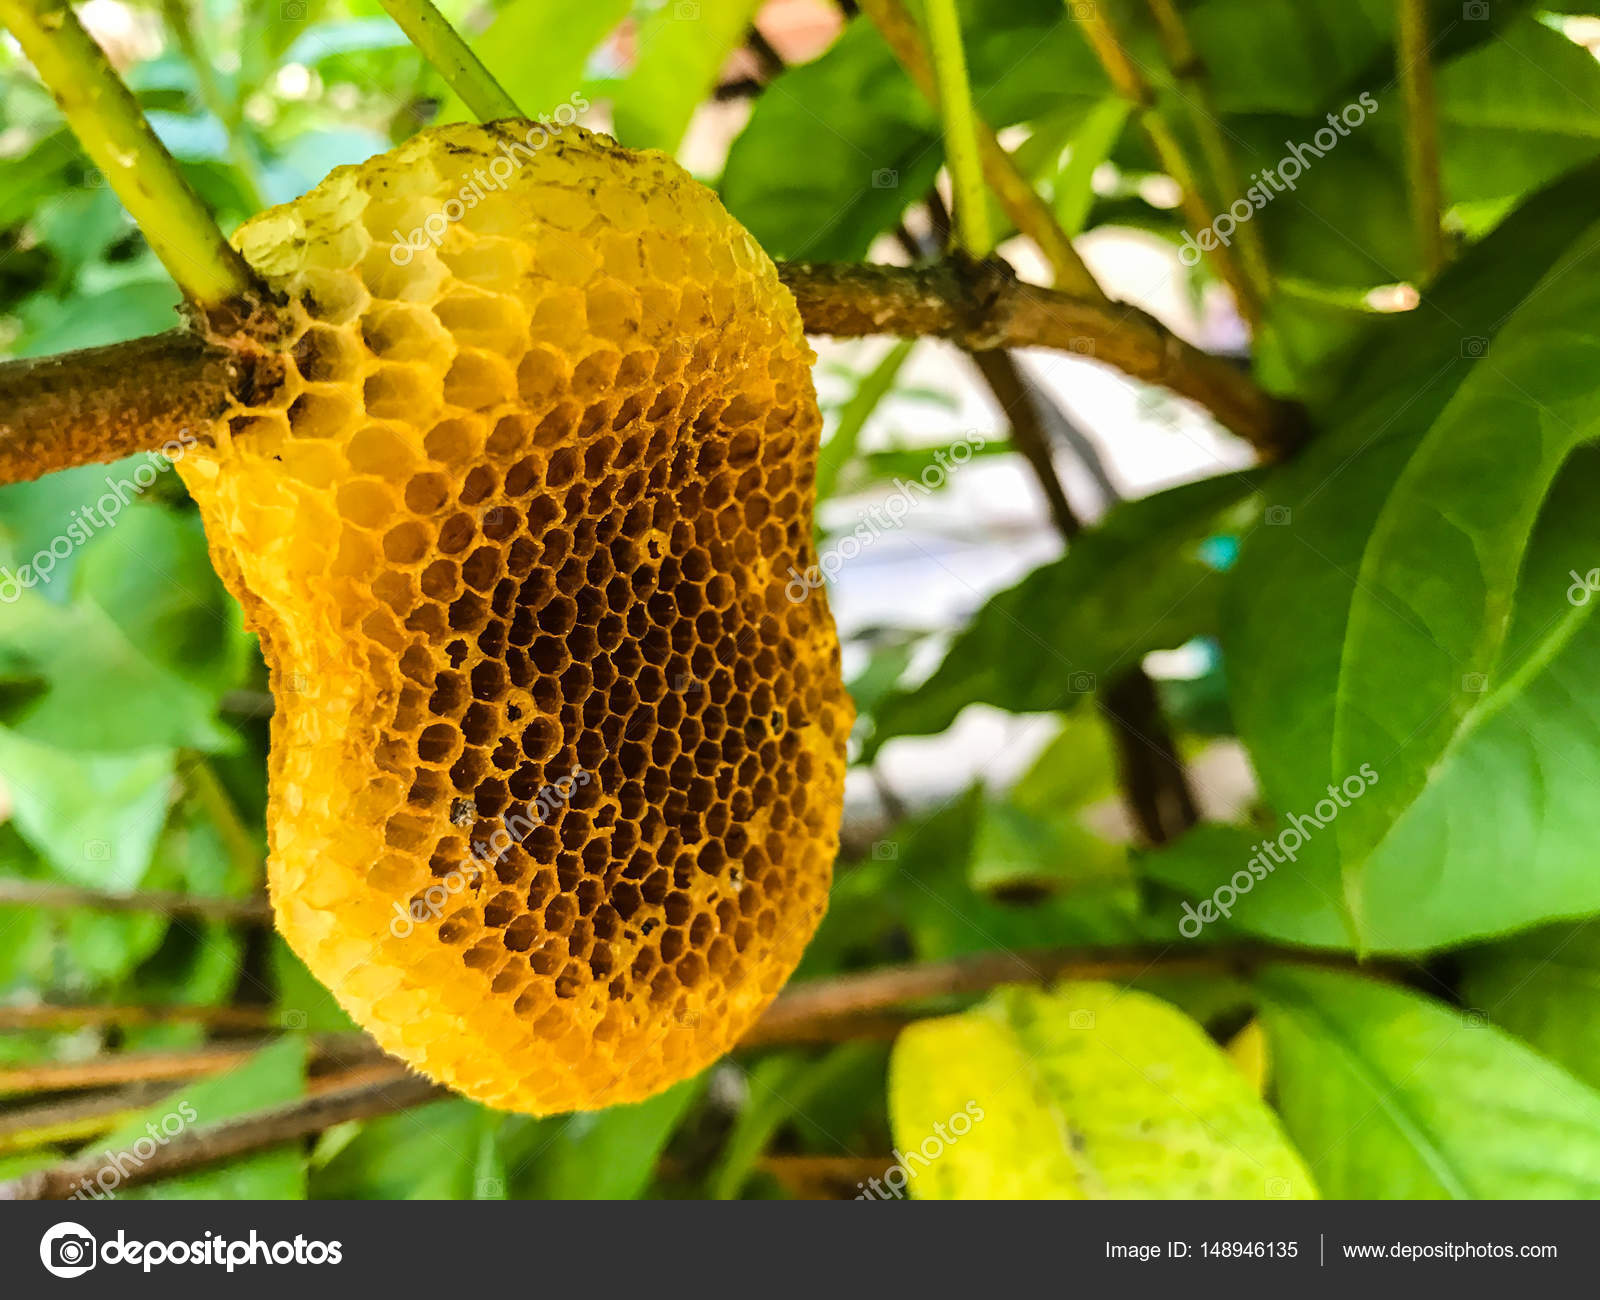 Image: Honeycomb on tree branch — Stock Photo © madozi #148946135